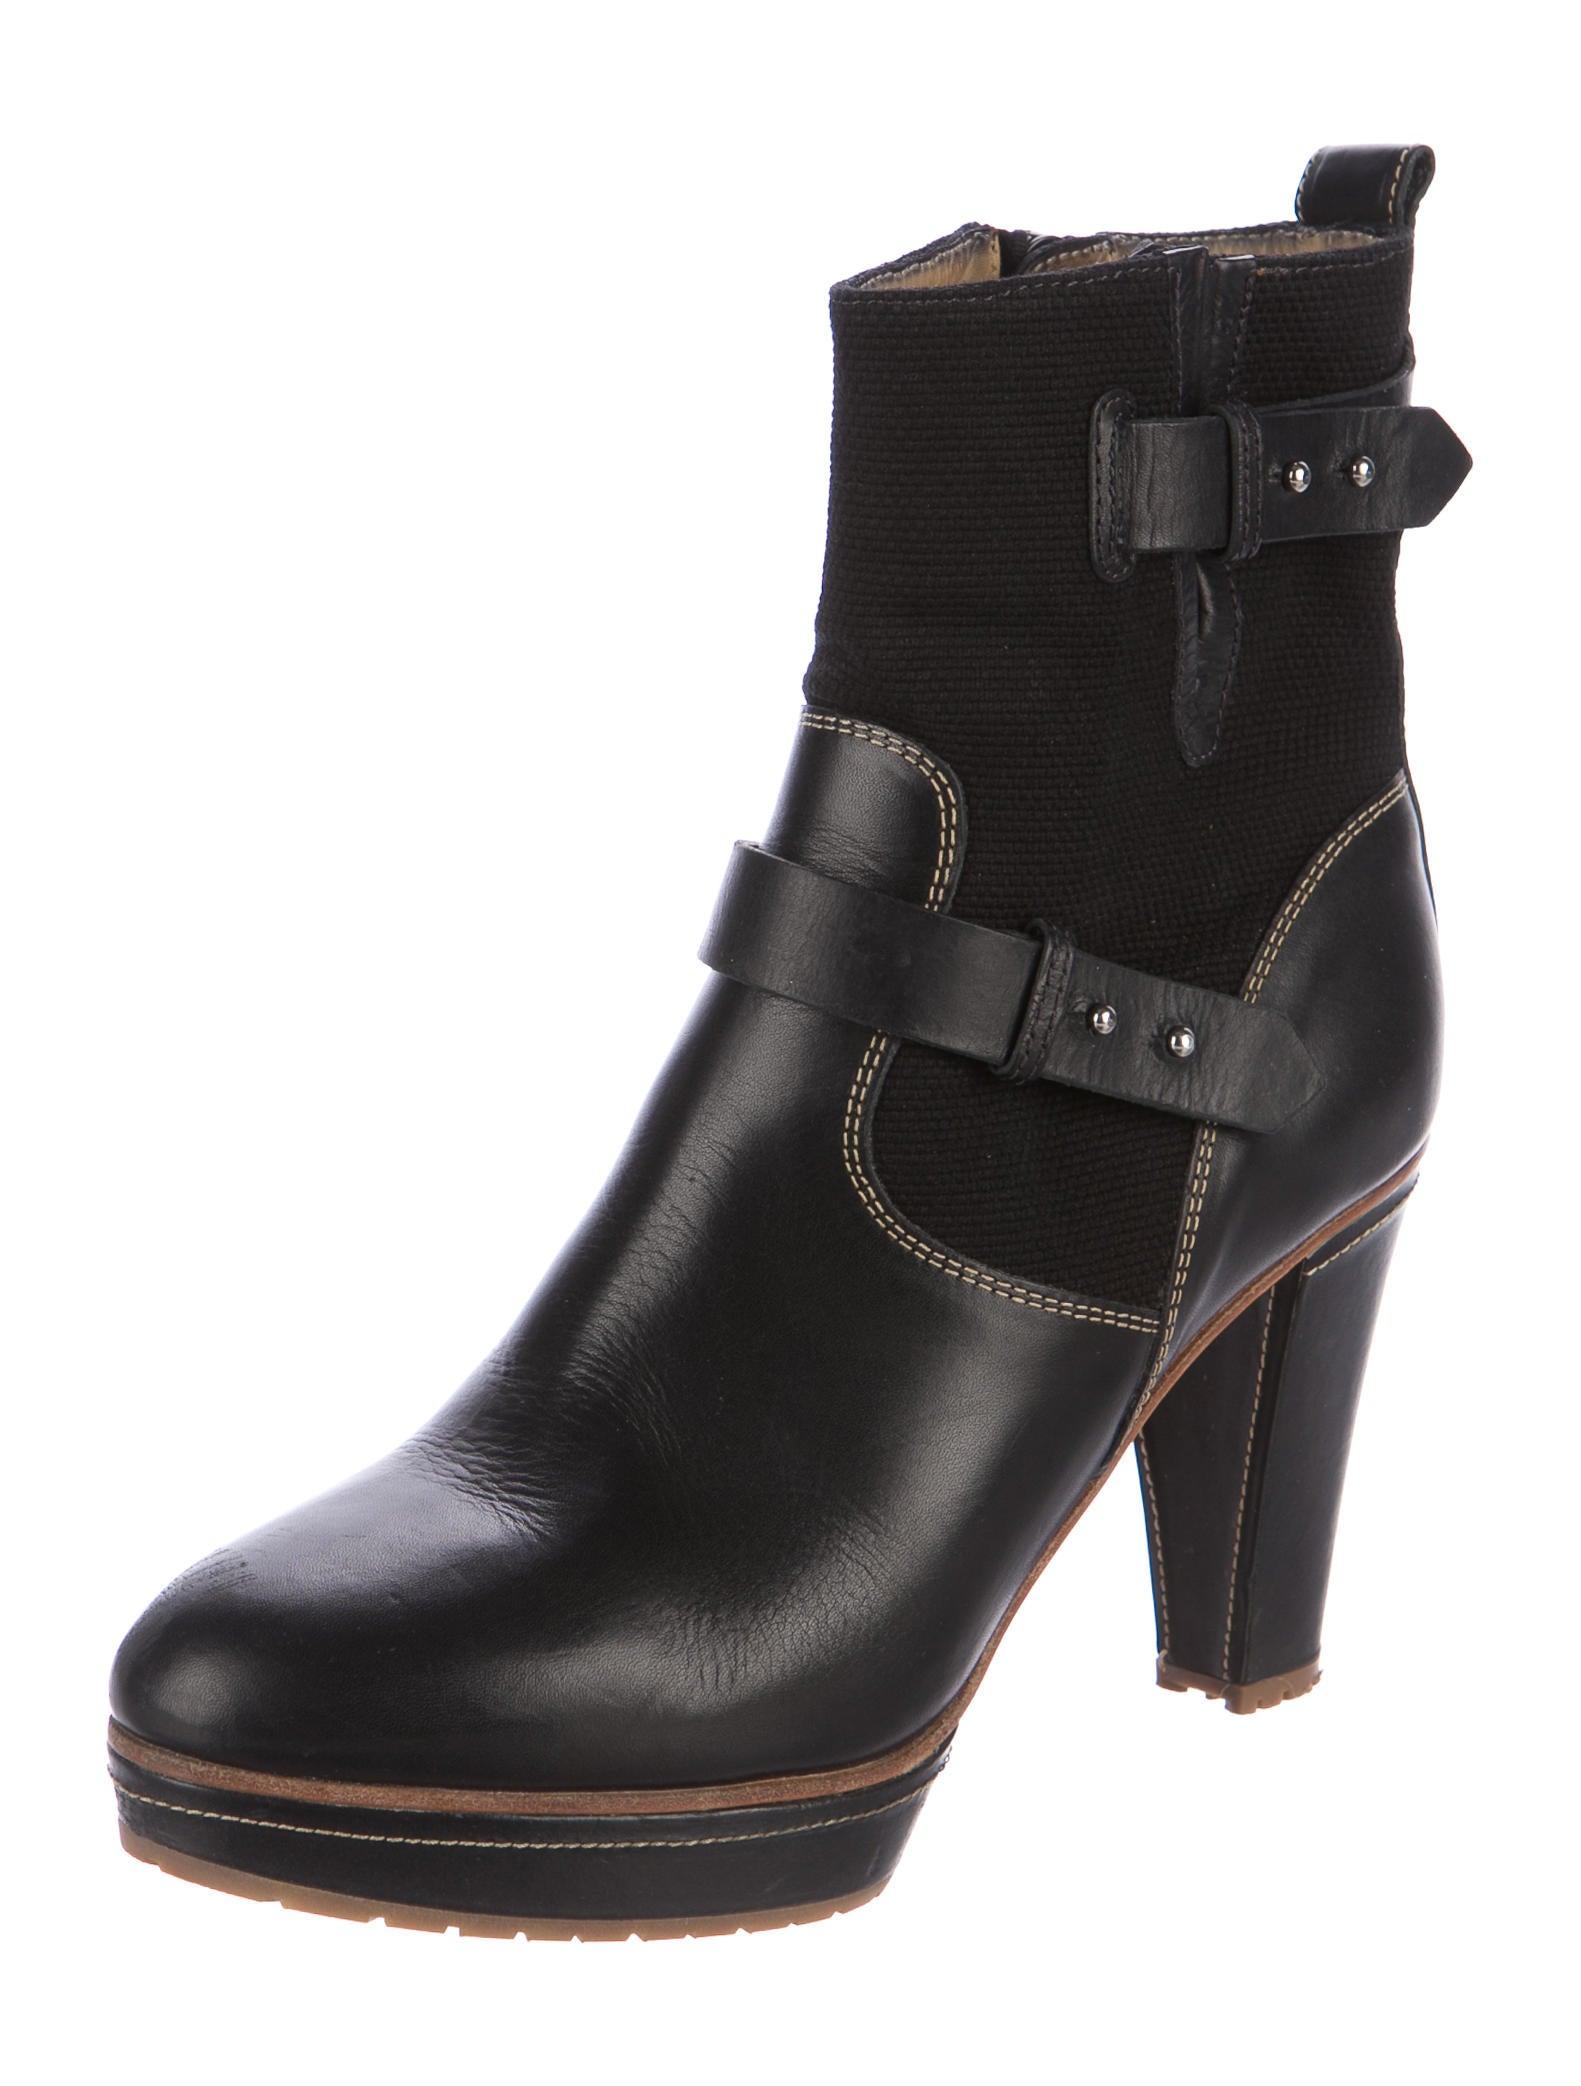 rag bone platform leather ankle boots shoes